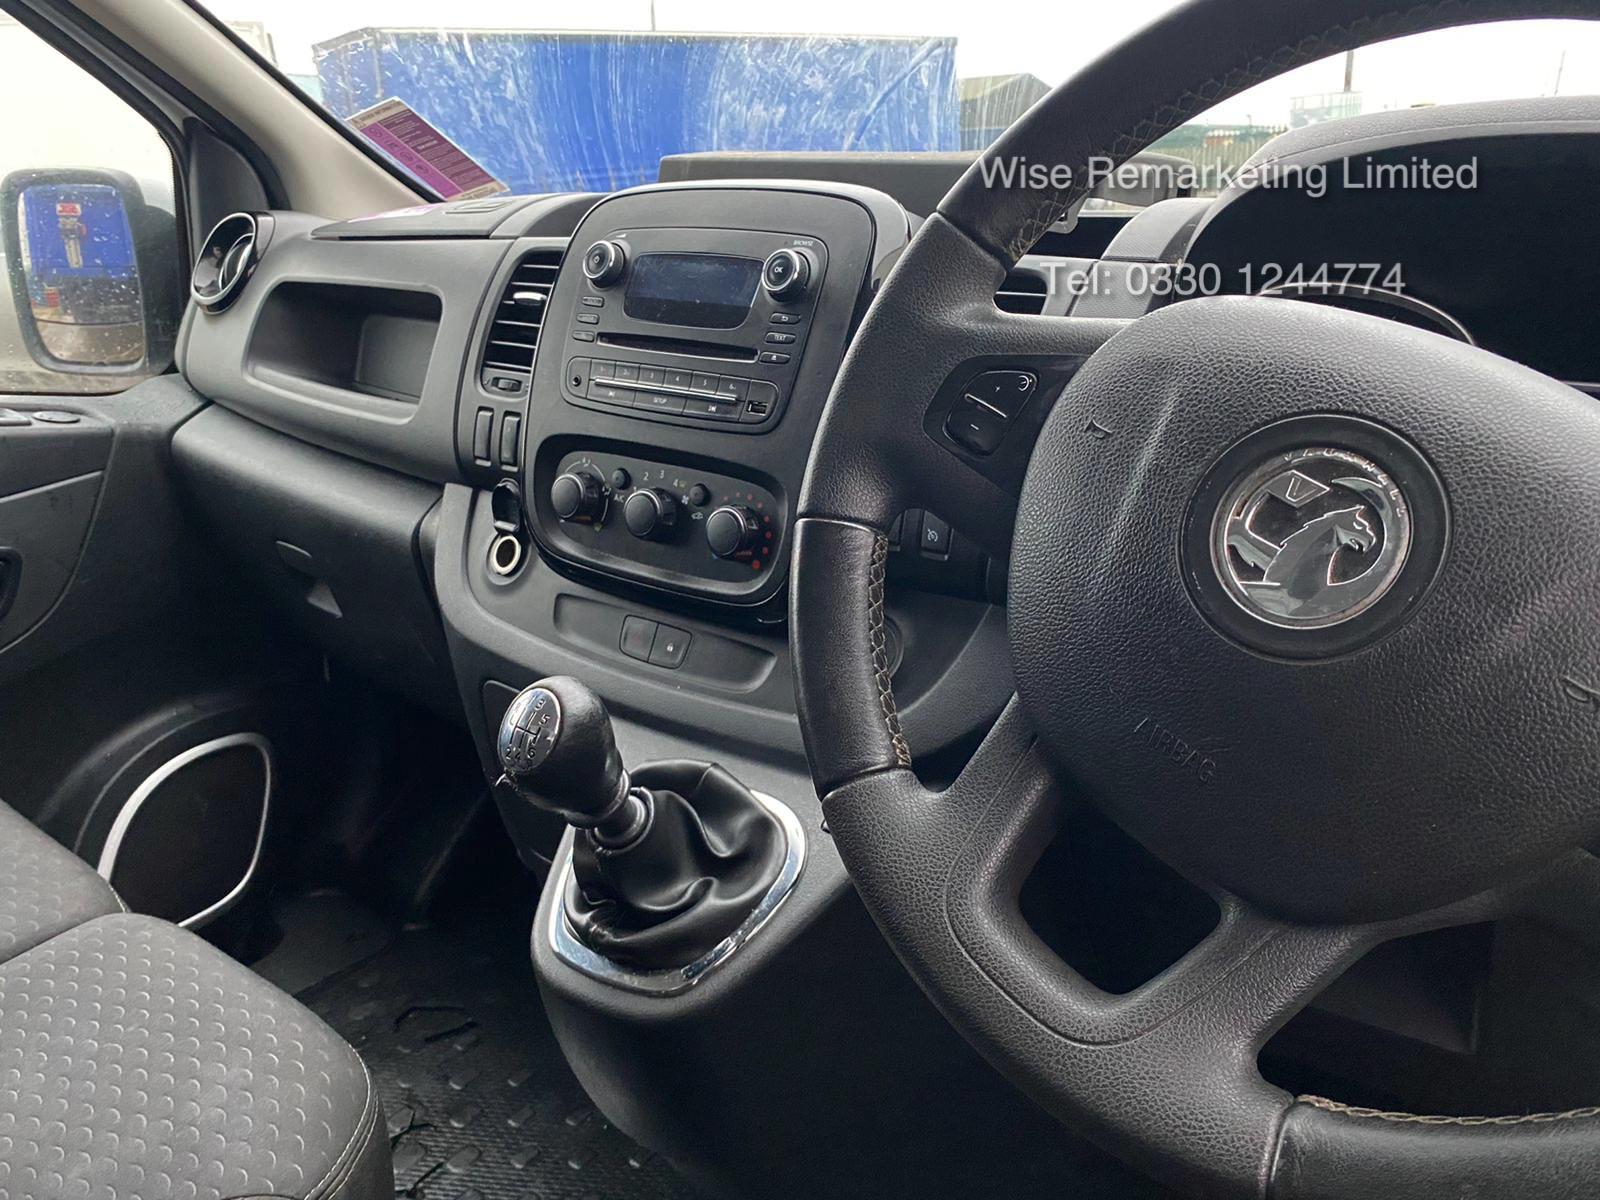 Vauxhall Vivaro 2700 Sportive 1.6 CDTI - 2017 Reg - Parking Sensors - Air Con - - Image 5 of 11